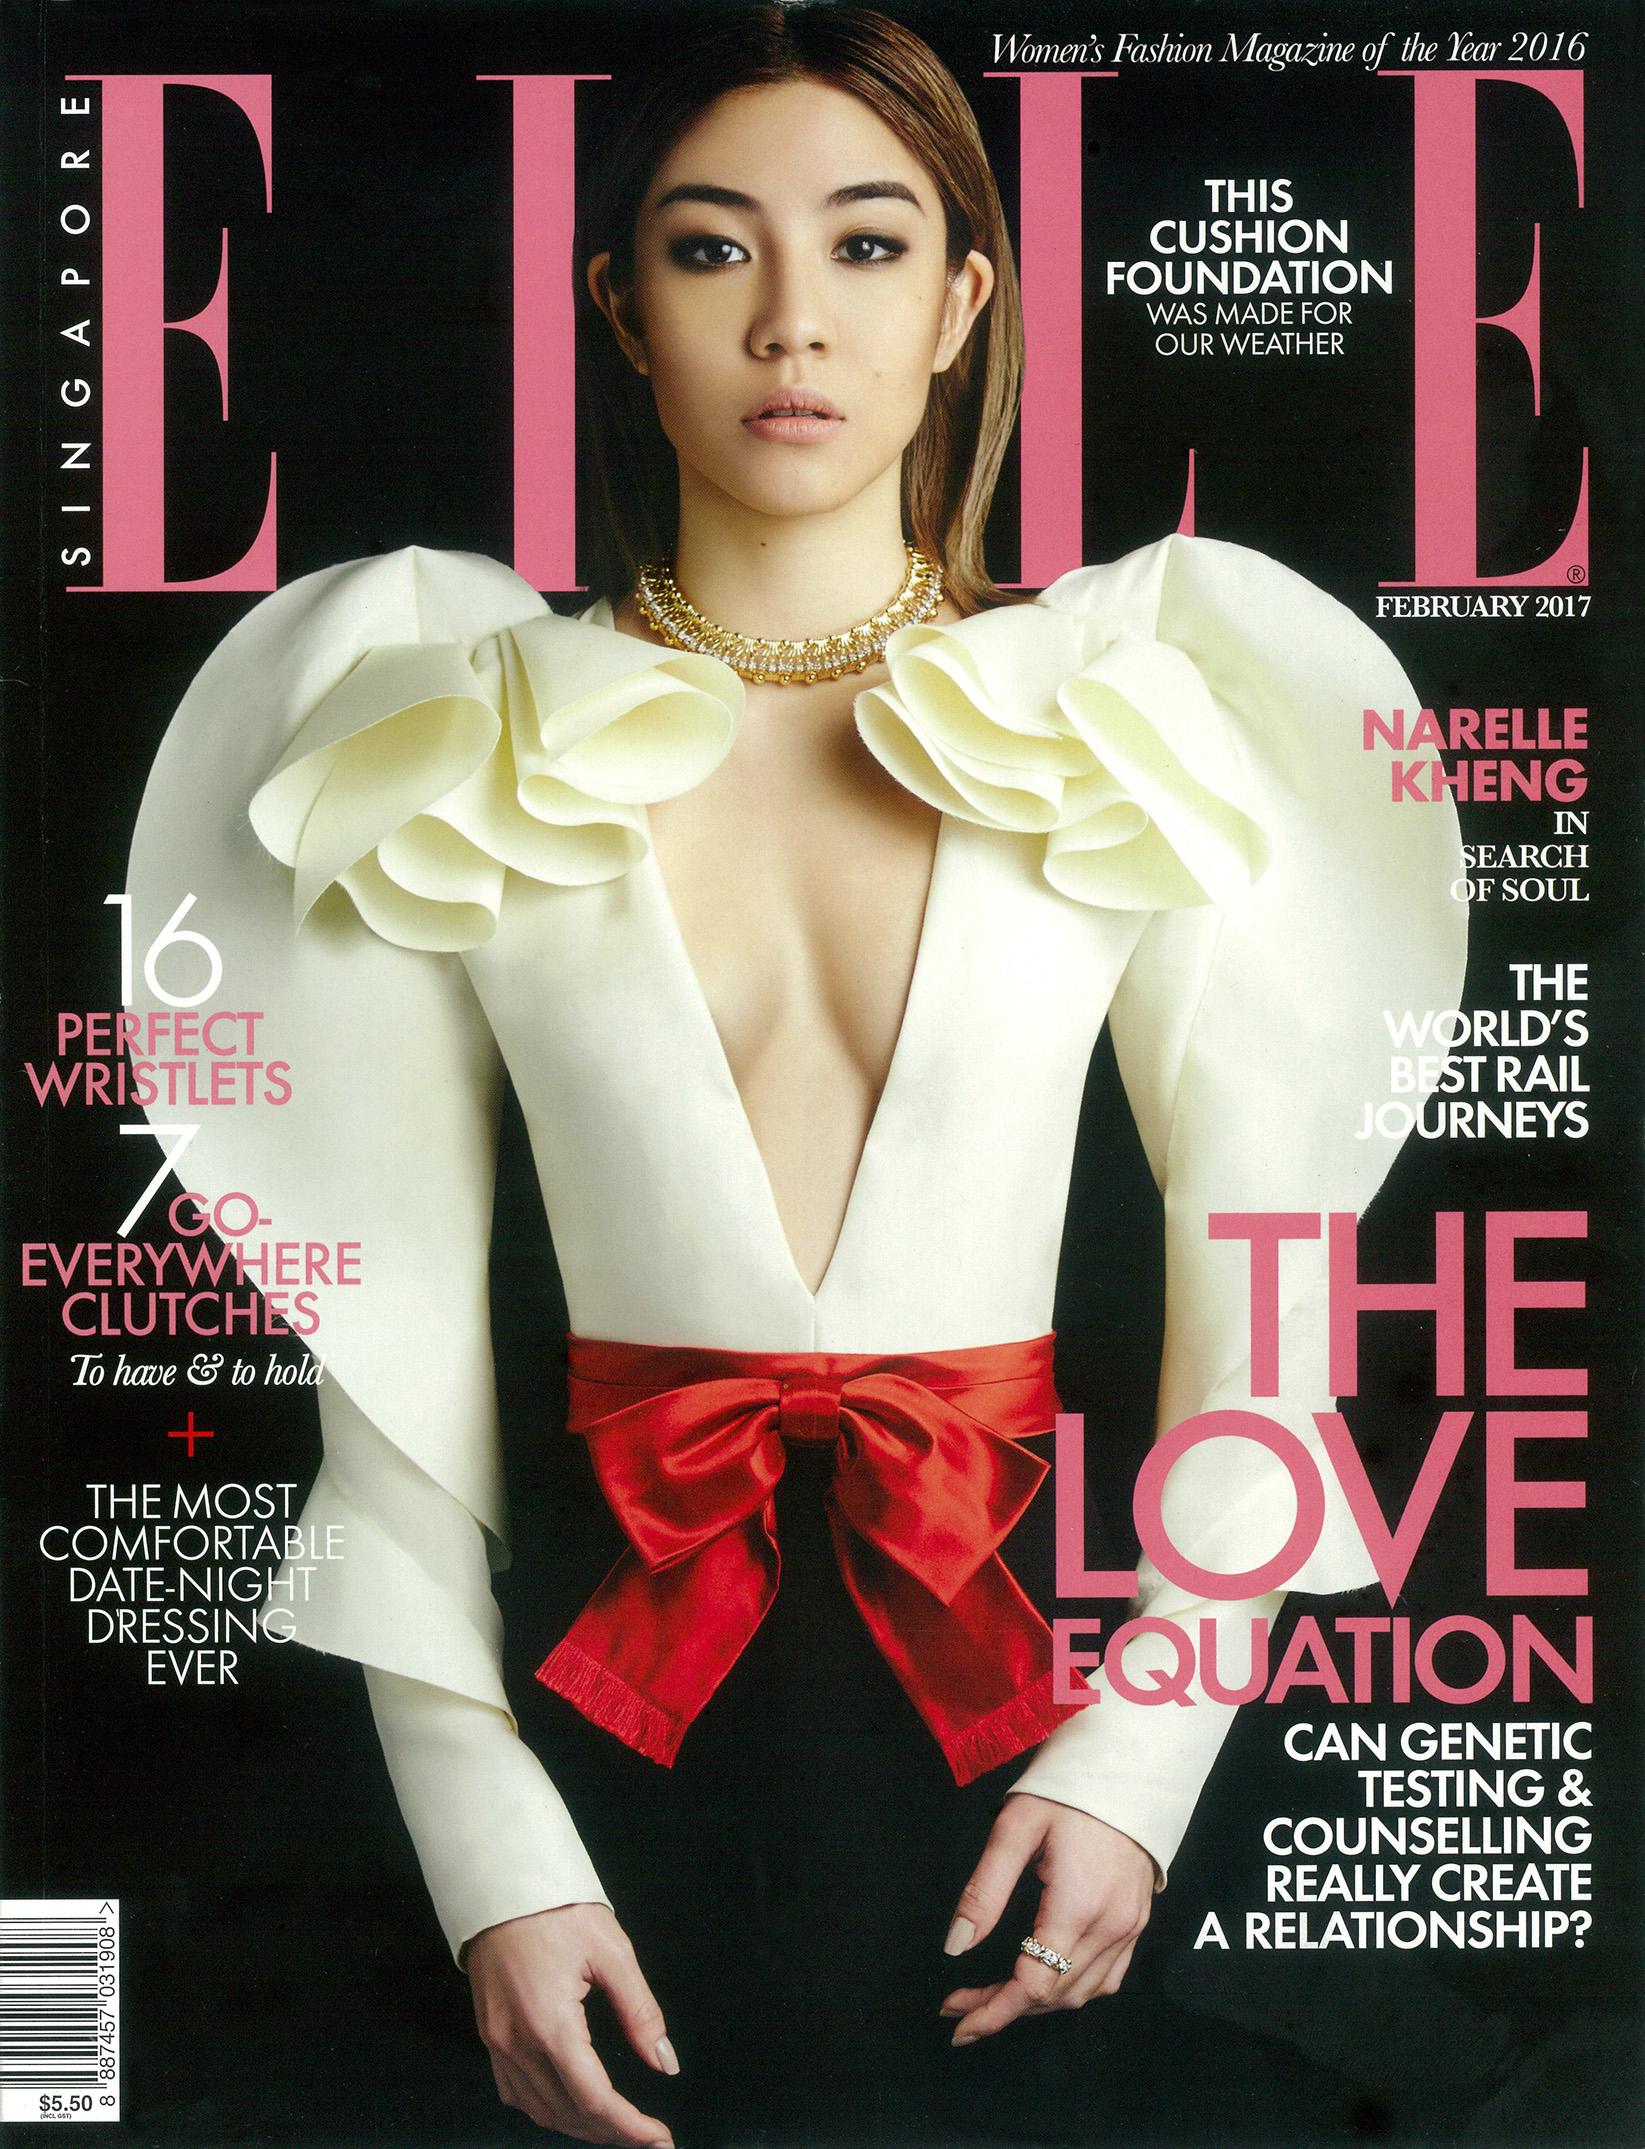 CBLU ELLE 2017.02.01 FEB 2017 Cover